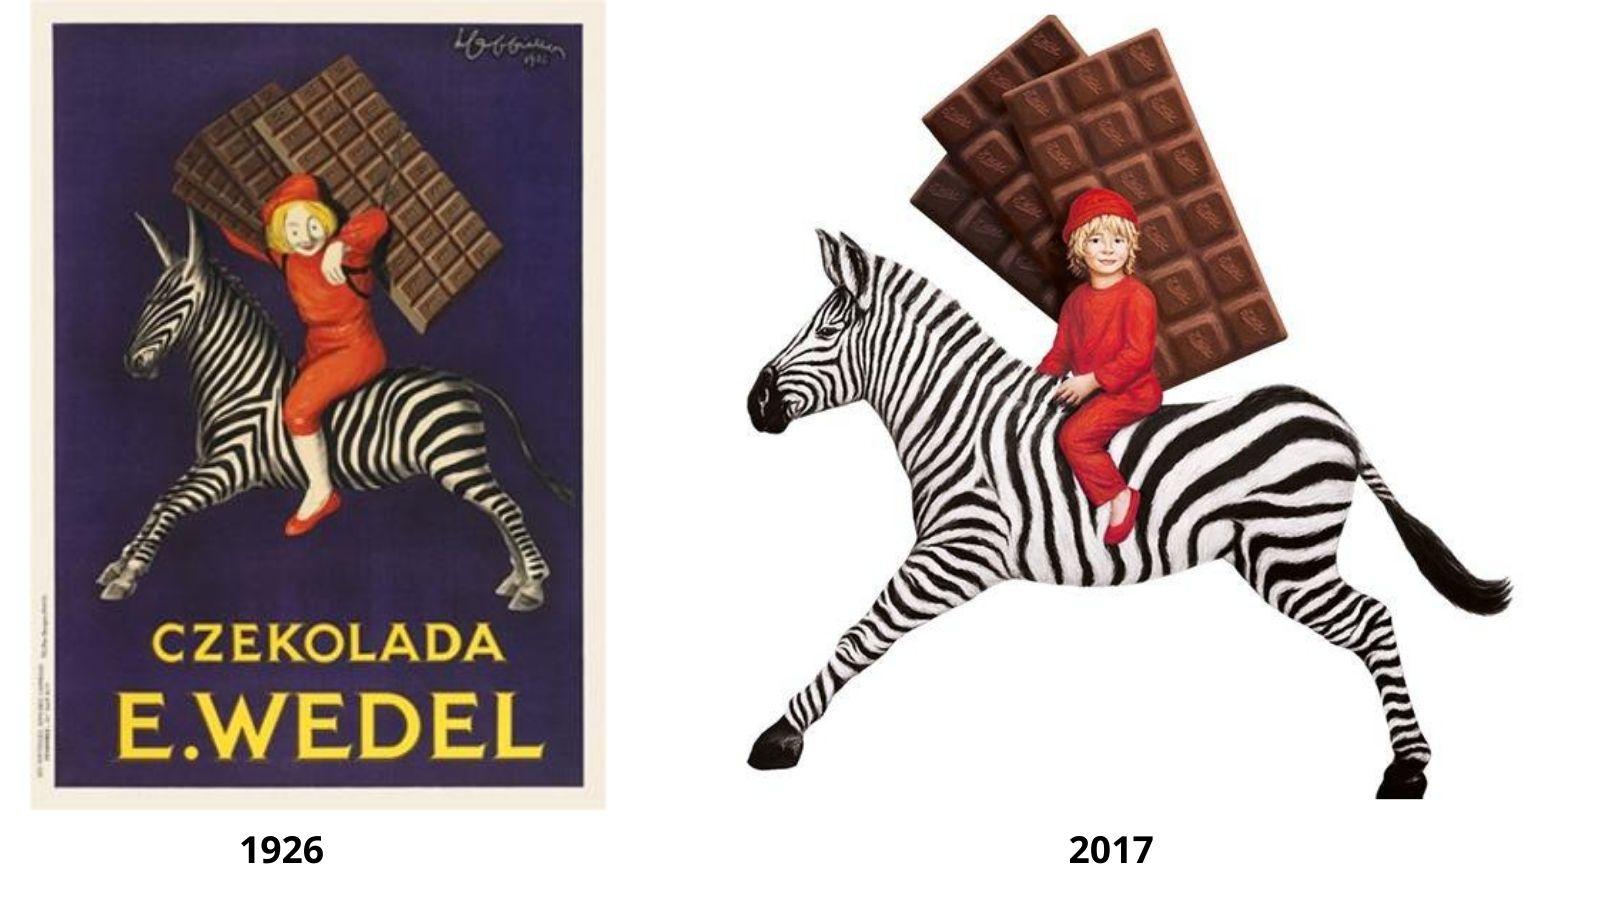 Klasyka E.Wedla w nowym wydaniu Branding mediarun wedel chlopiec